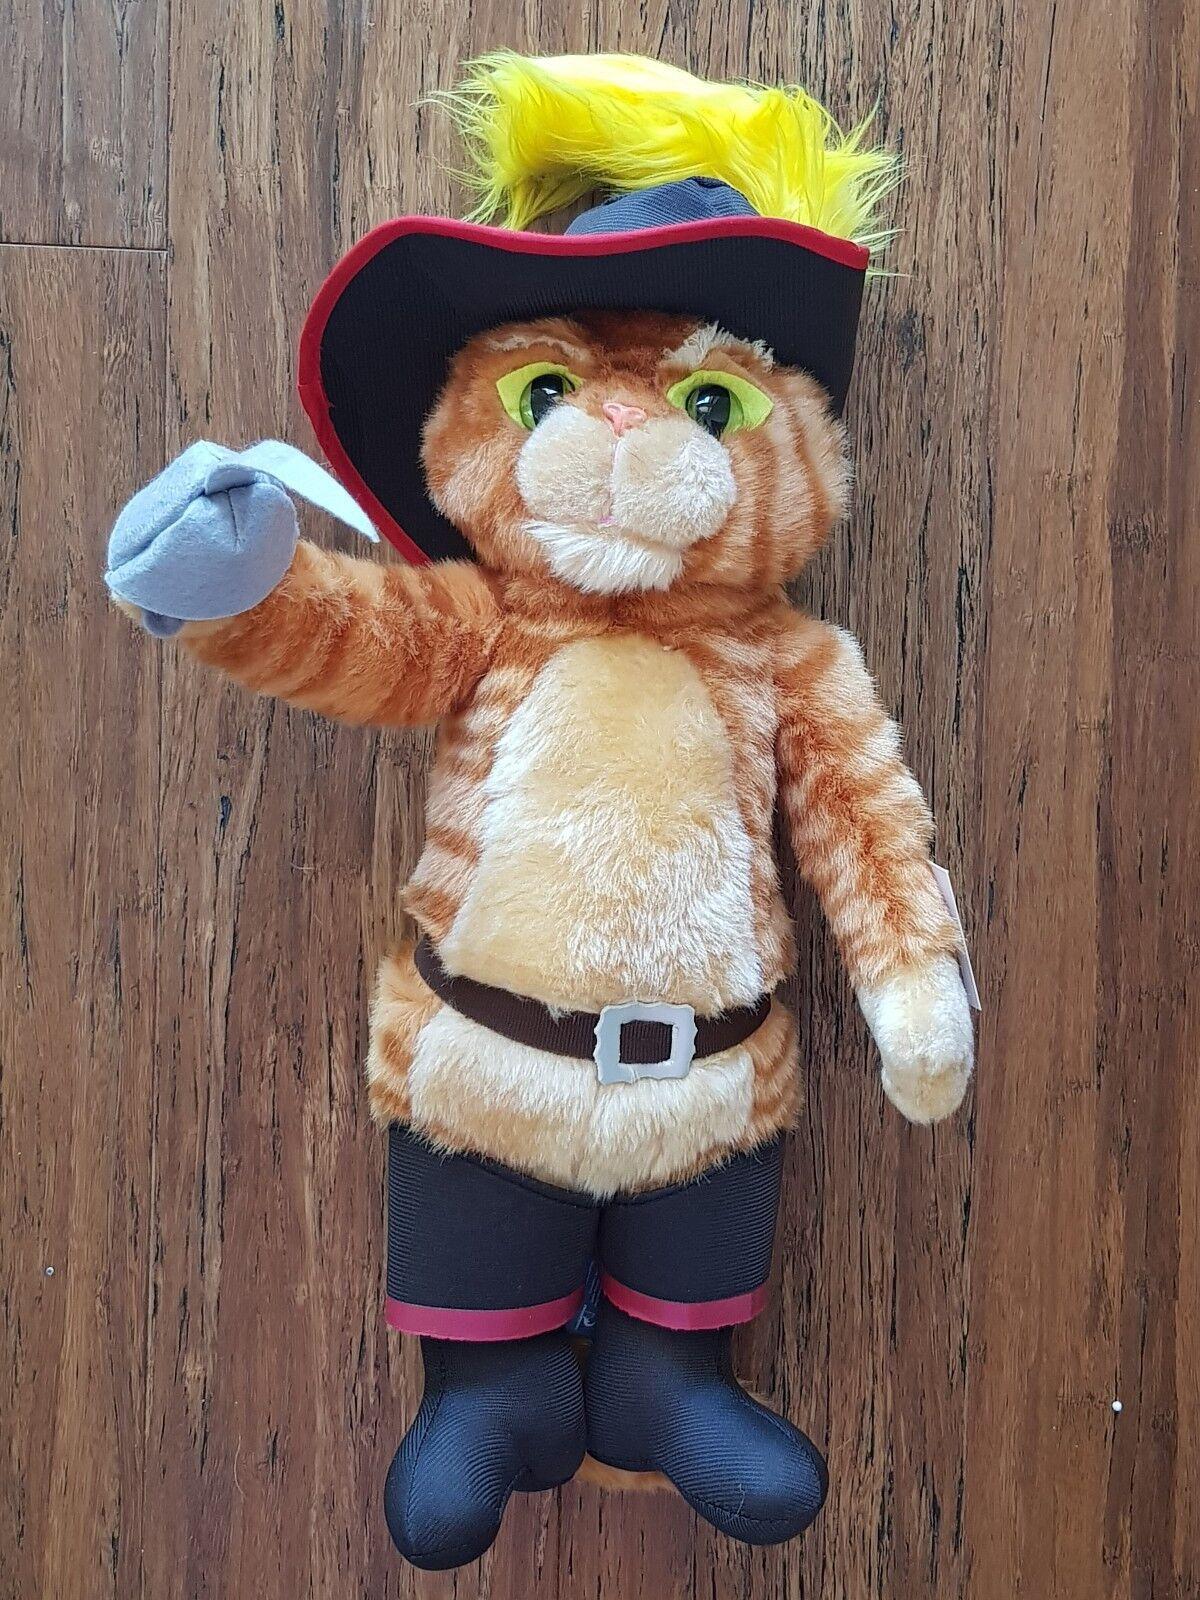 Dreamworld Shrek Puss in Boots Plush Soft Stuffed Doll Toy 16'' 40 cm